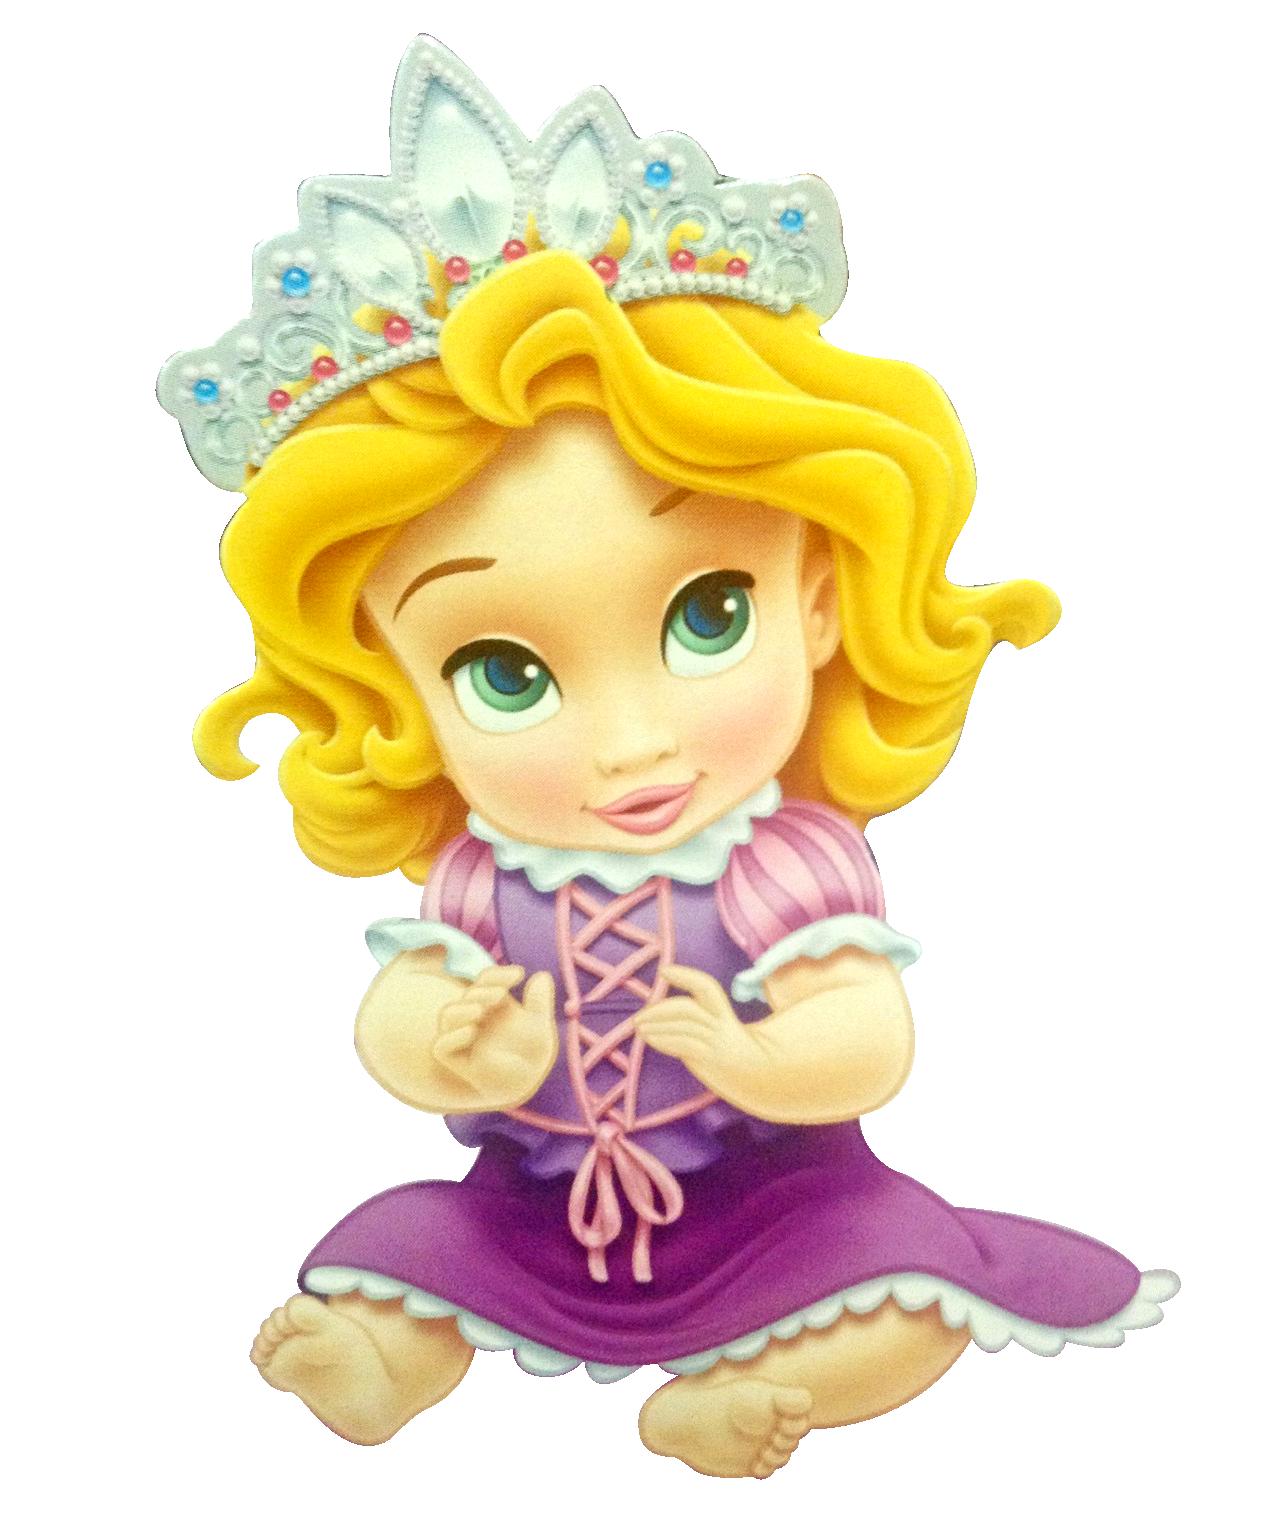 Rapunzel clipart baby. Princesa disney png princesas